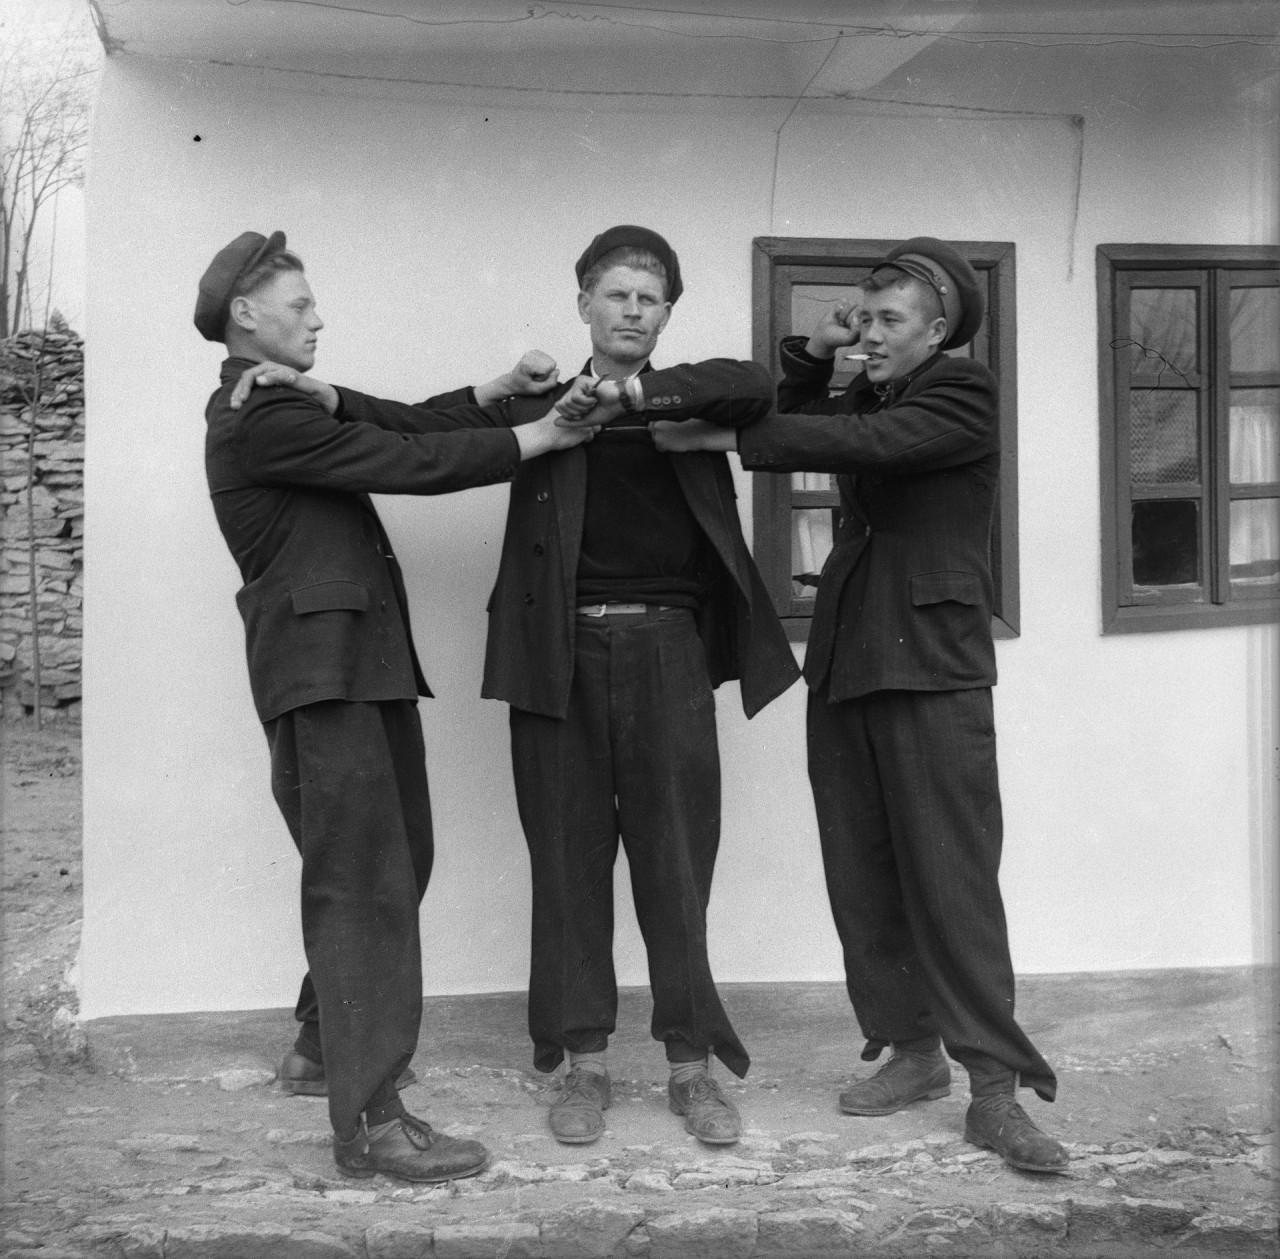 Архив сельского фотографа Захарии Кушнира (5)